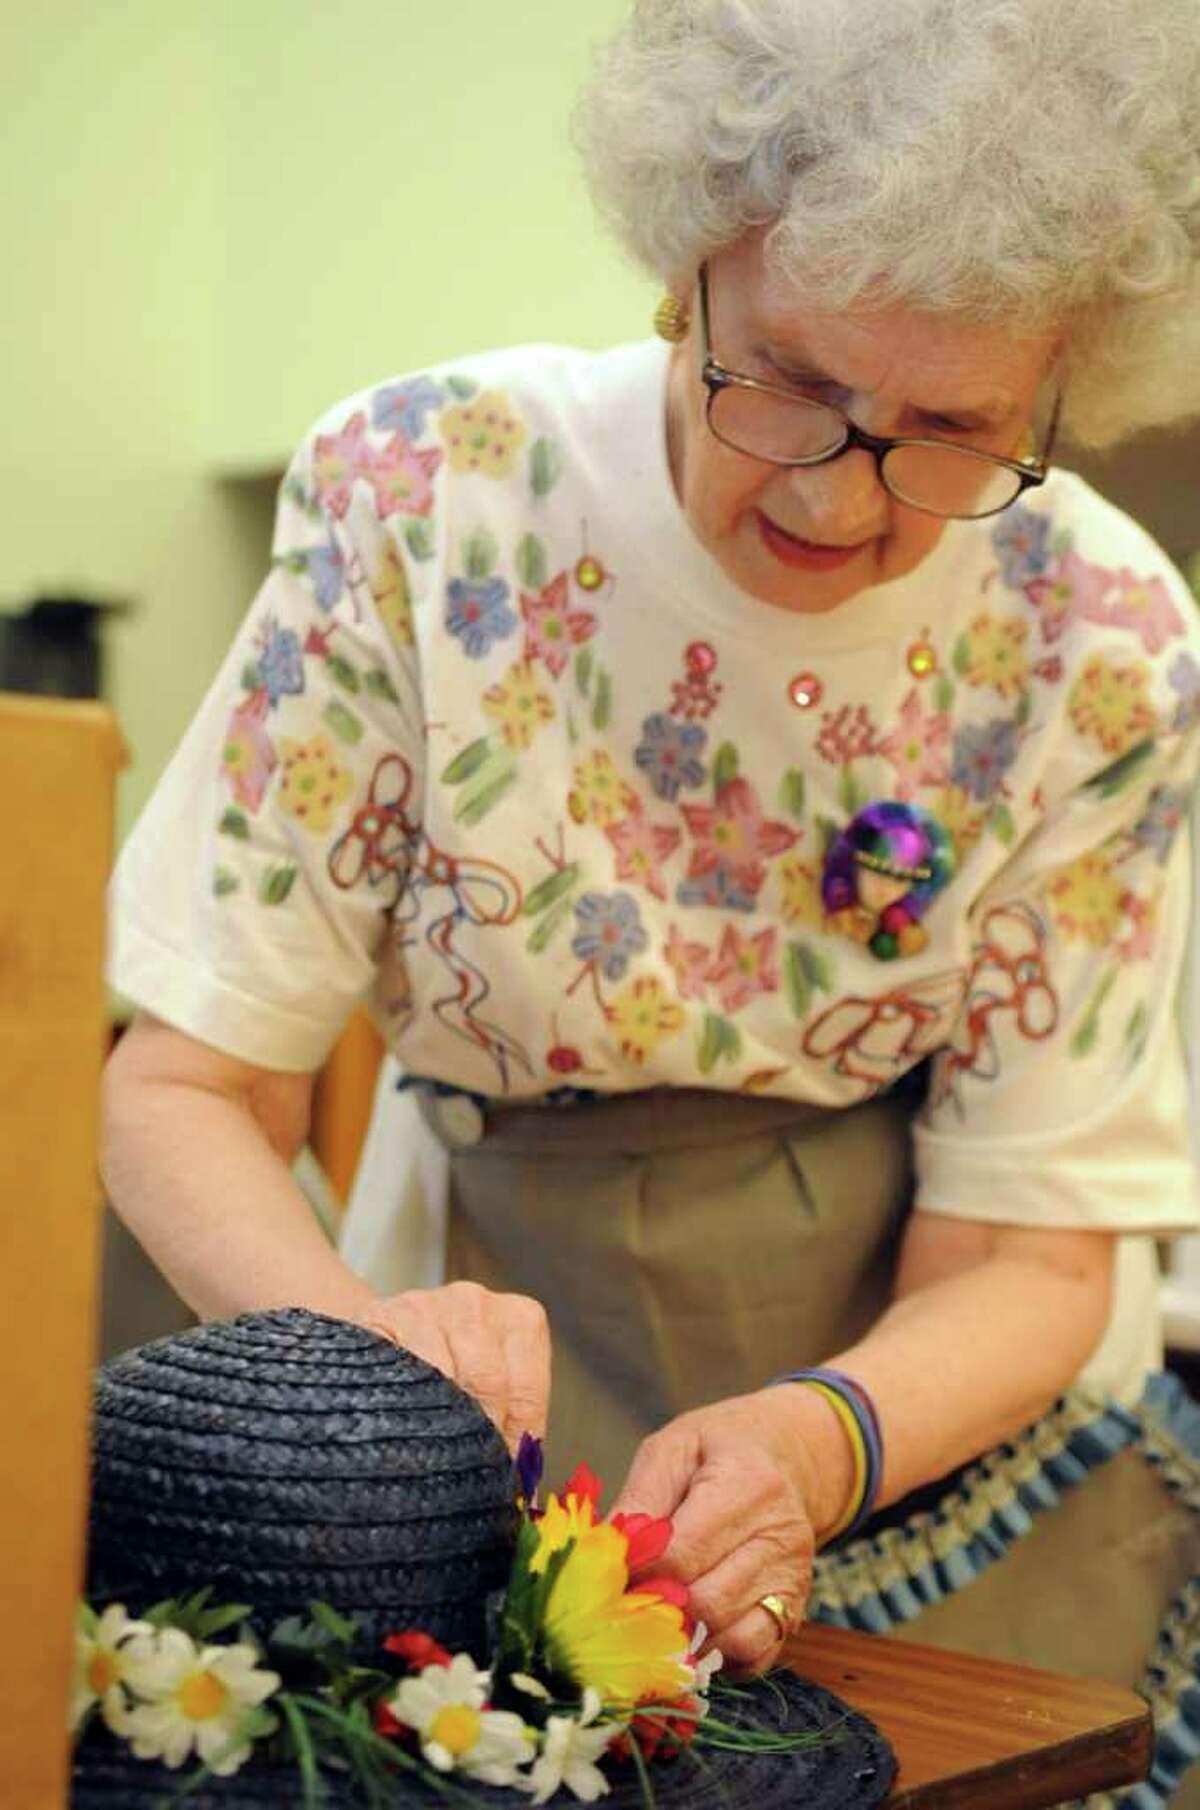 Sarah Masso adorns a bonnet during a demostration Thursday, April 21, 2011 at the Baldwin Center in Stratford, Conn.